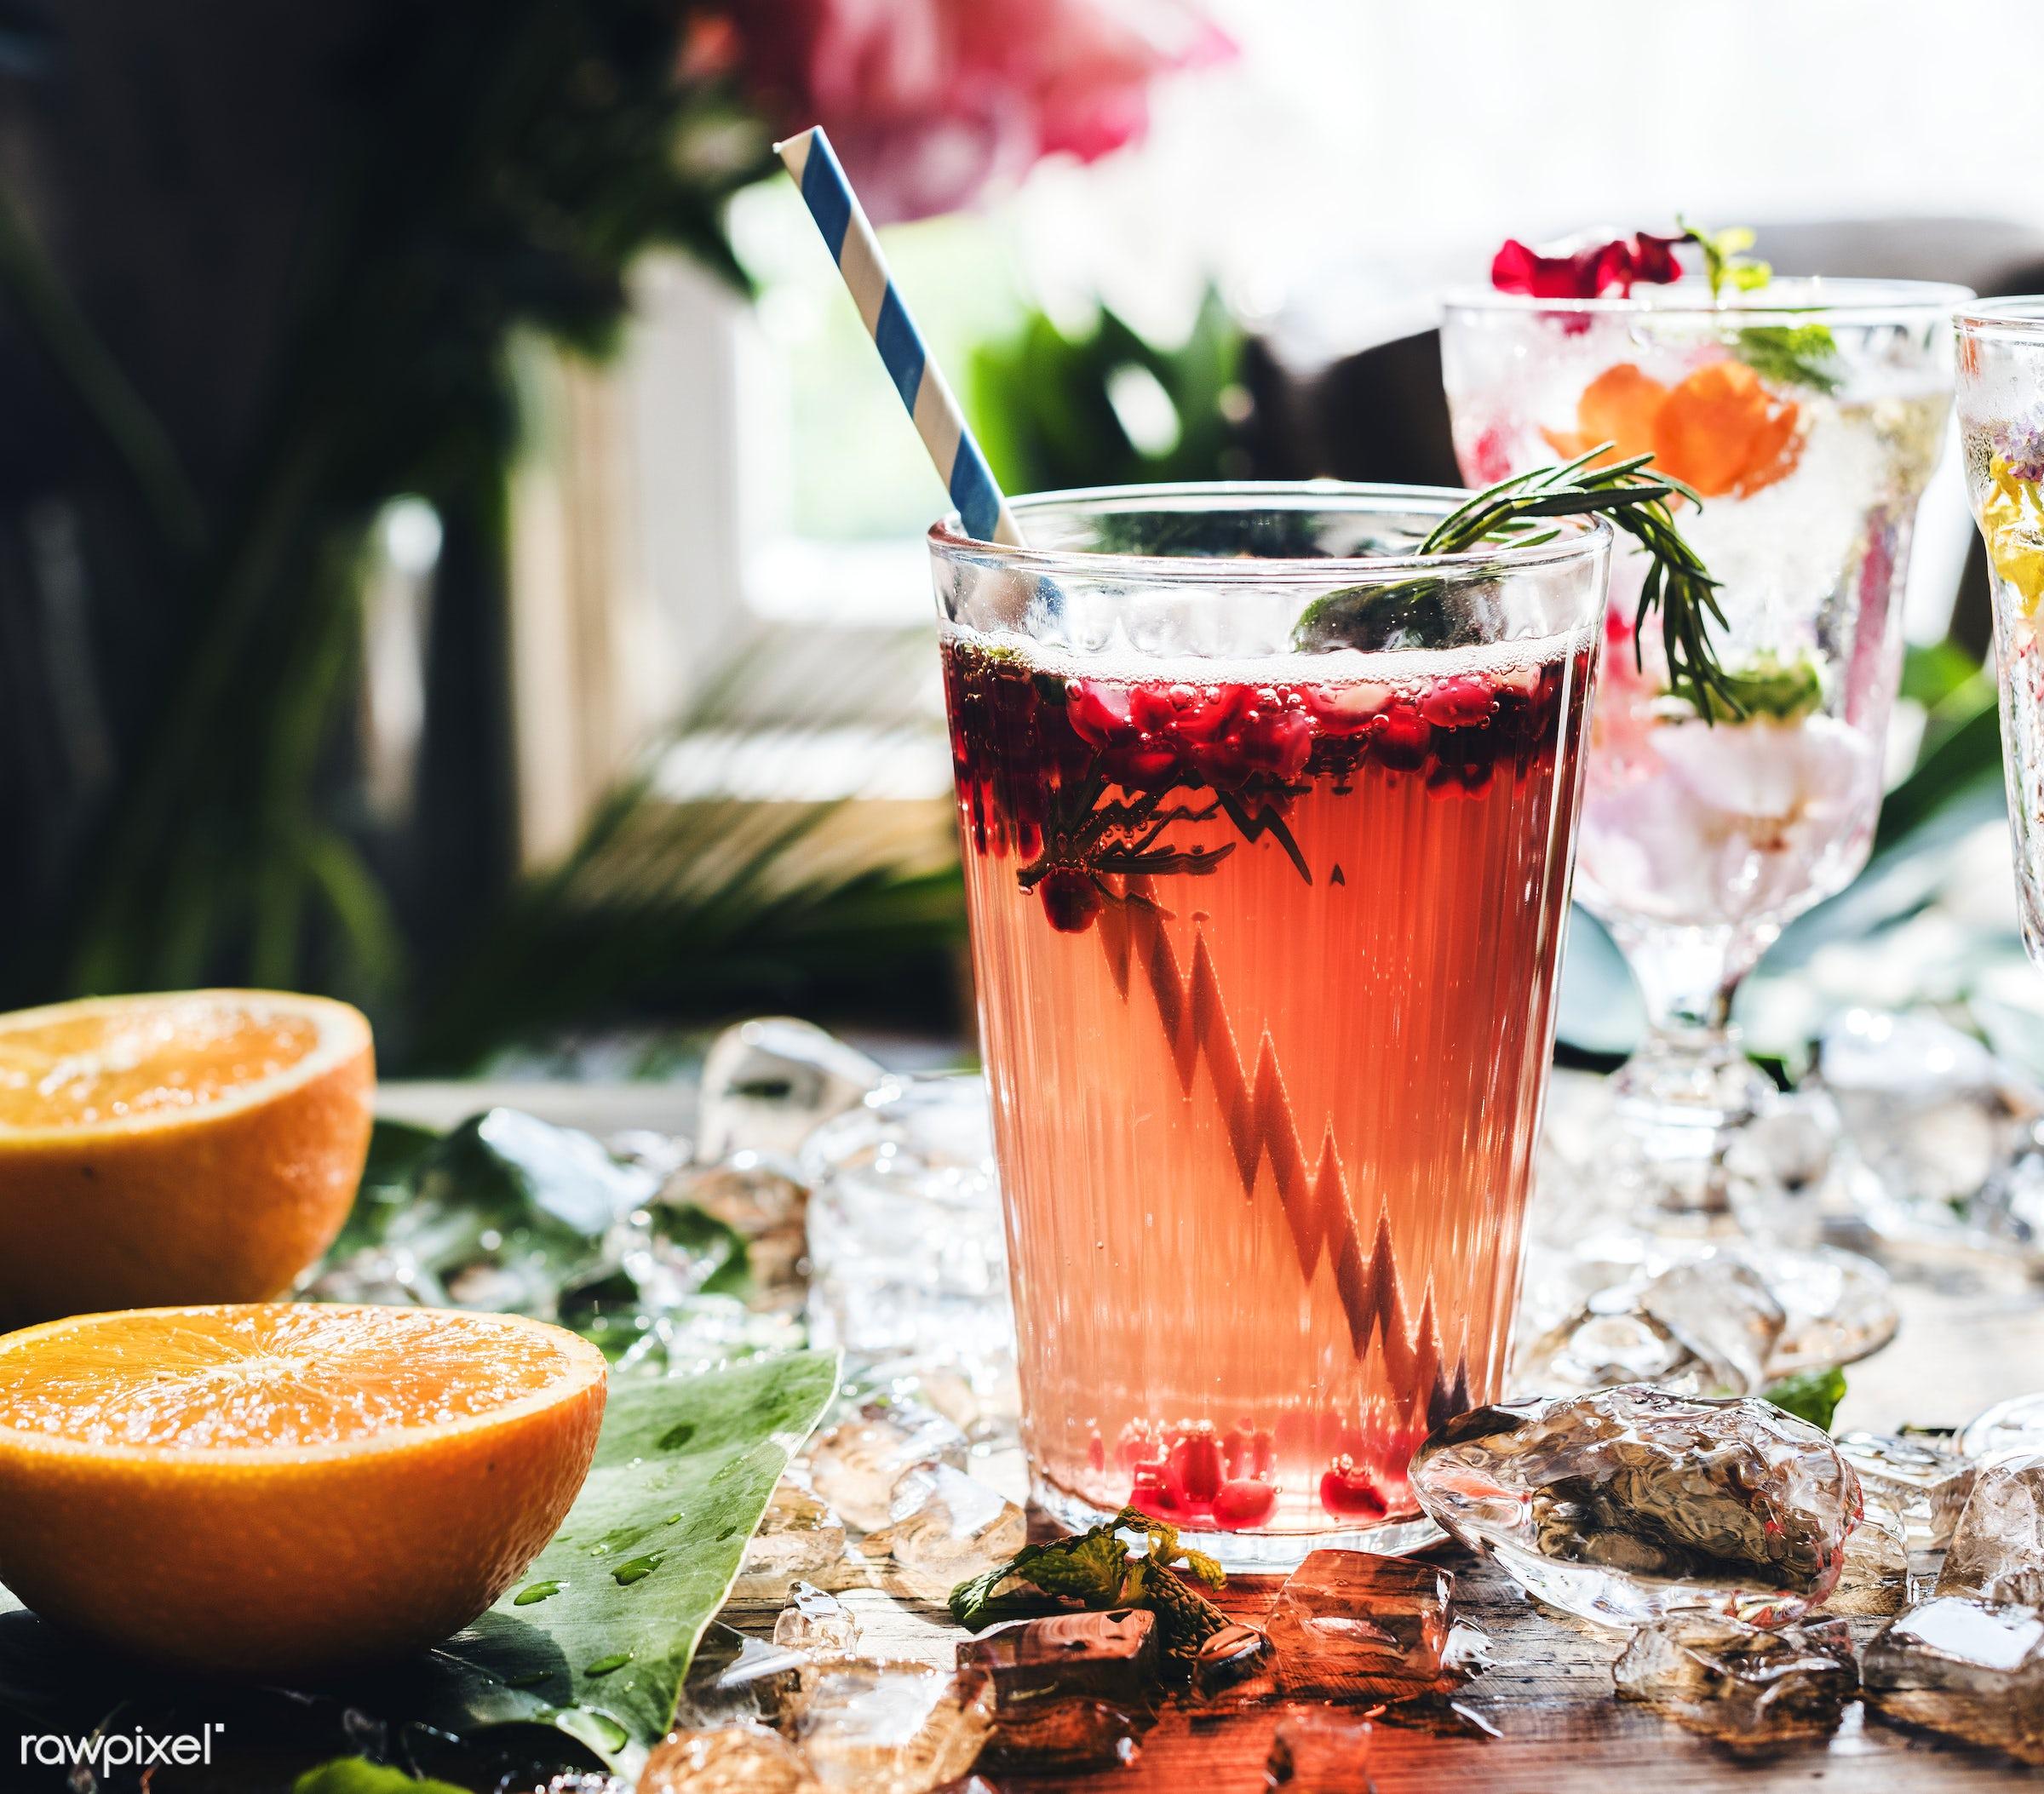 Summer cocktails with decorative flower petals - drink, cocktail, alcohol, beverage, citrus, flower petals, flowers, fresh,...